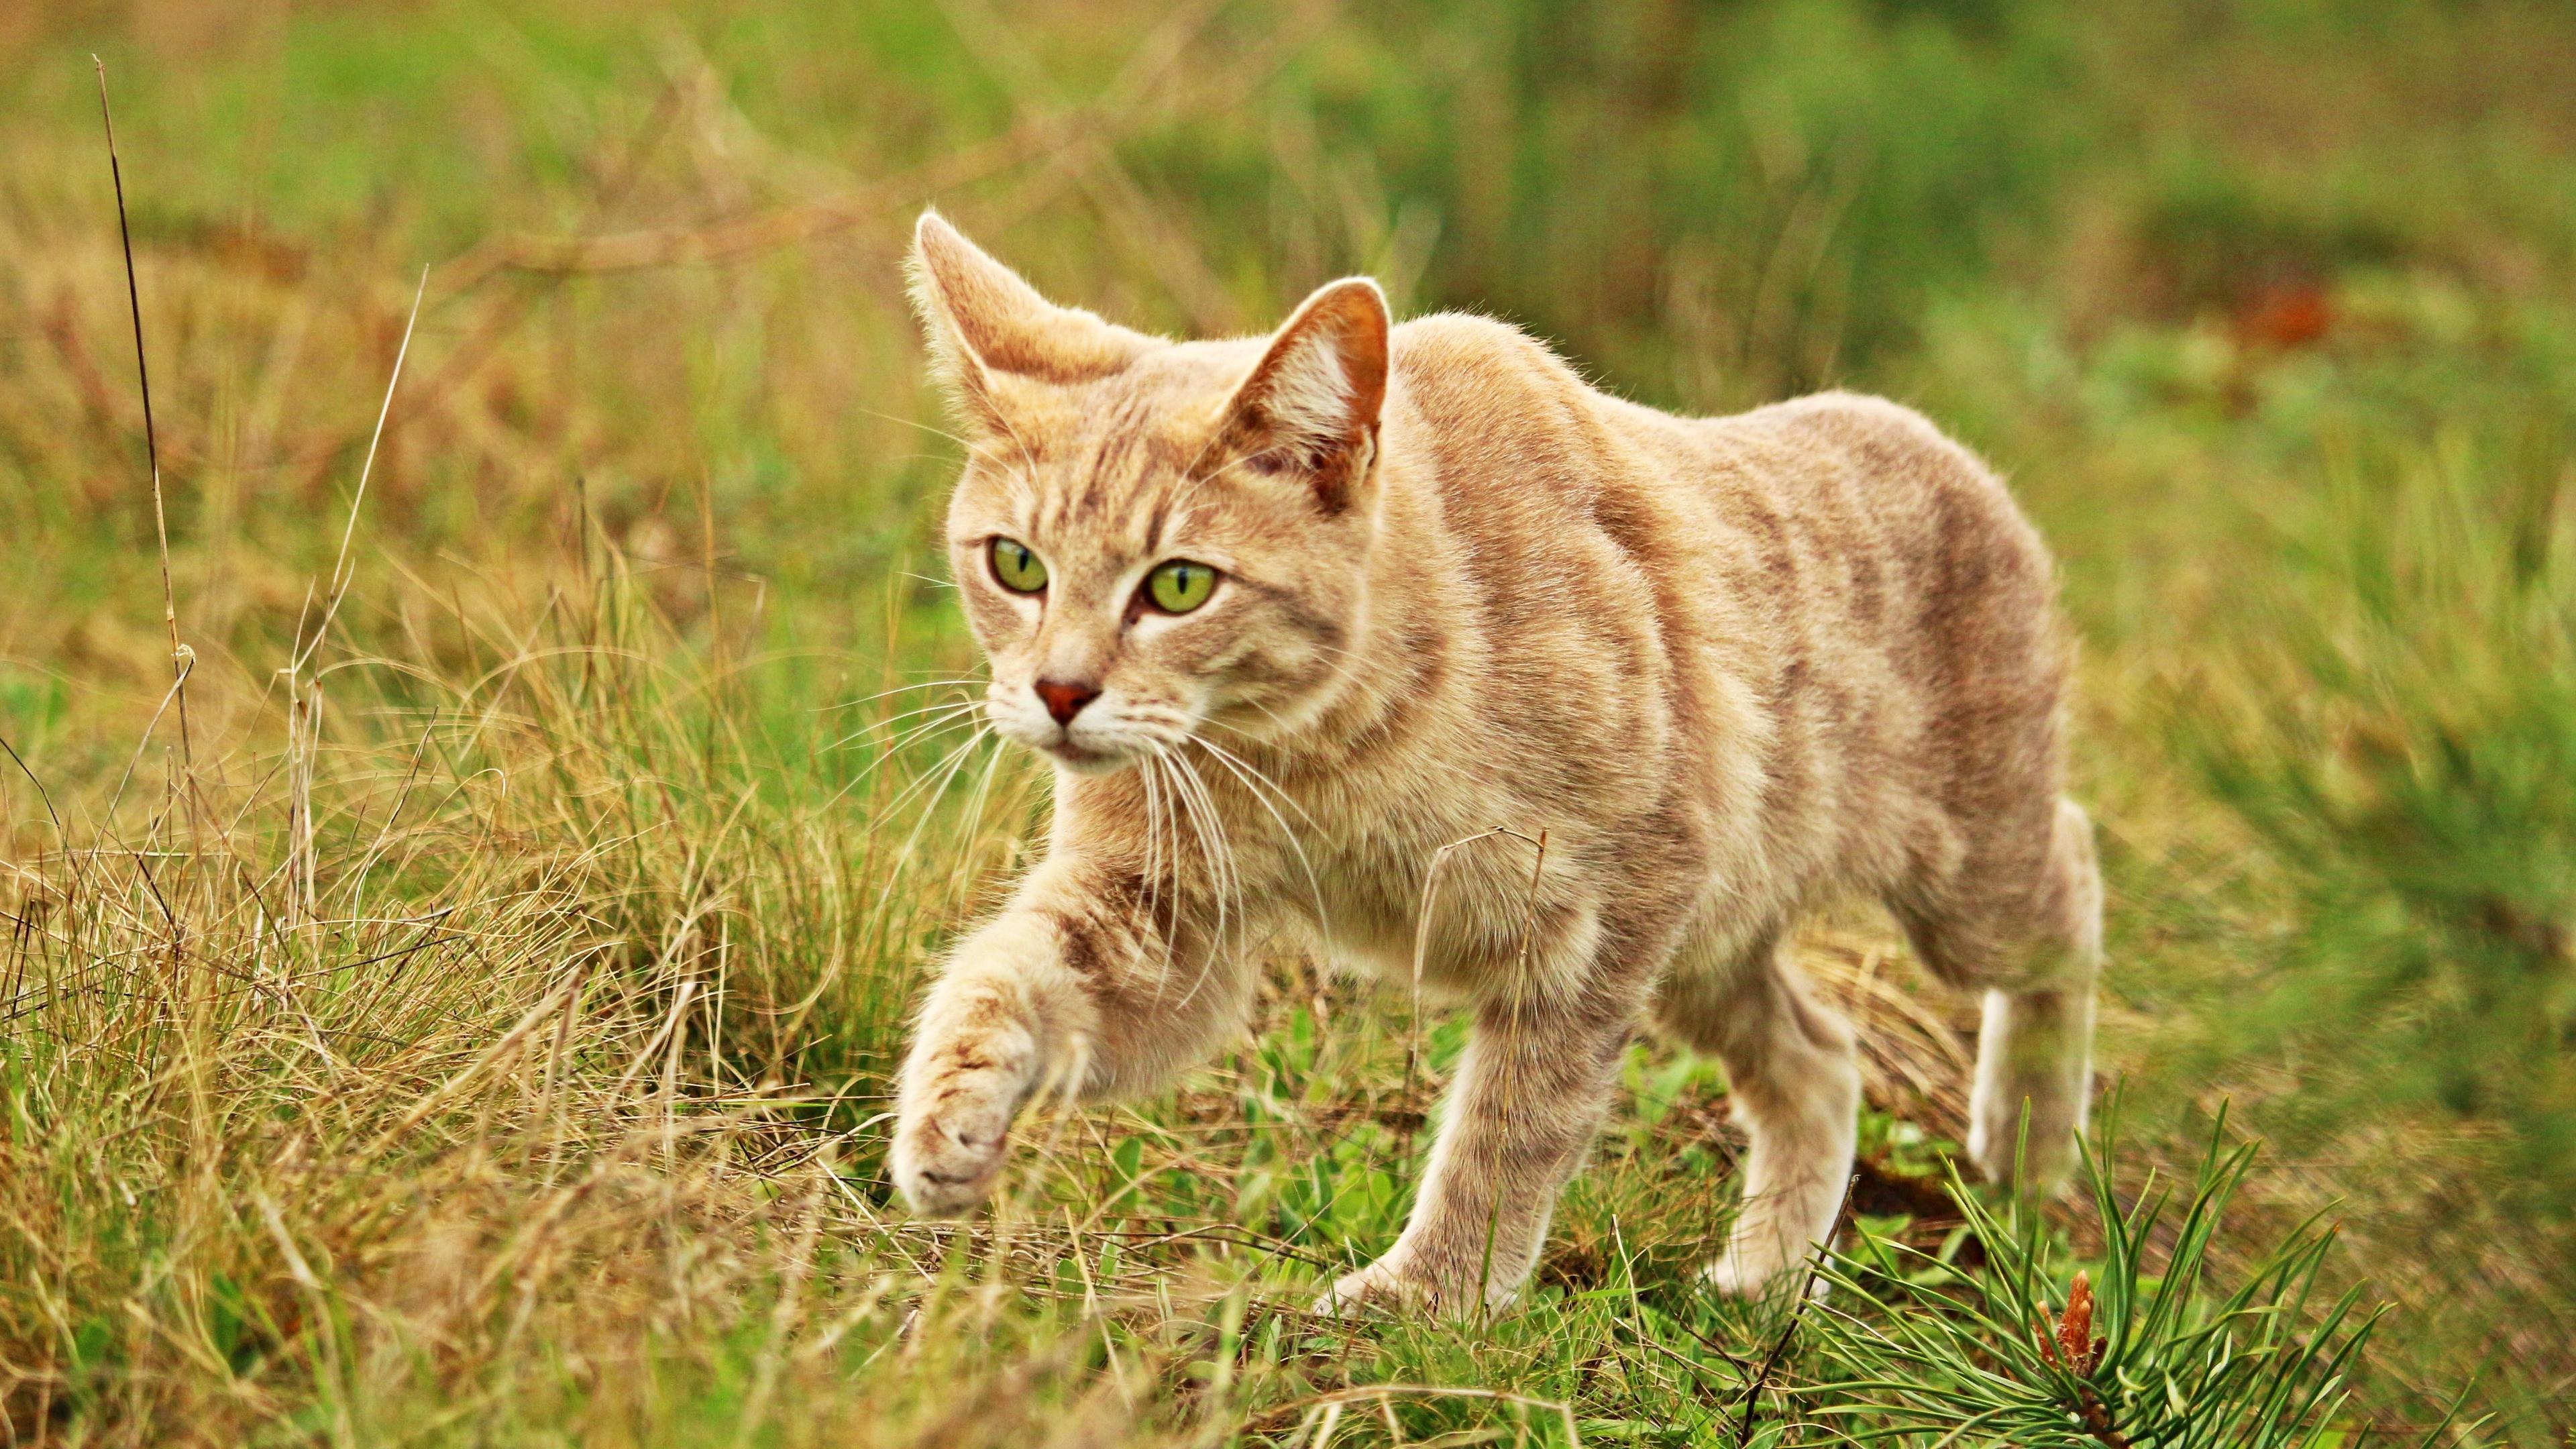 cat grass walk 4k 1542241969 - cat, grass, walk 4k - walk, Grass, Cat